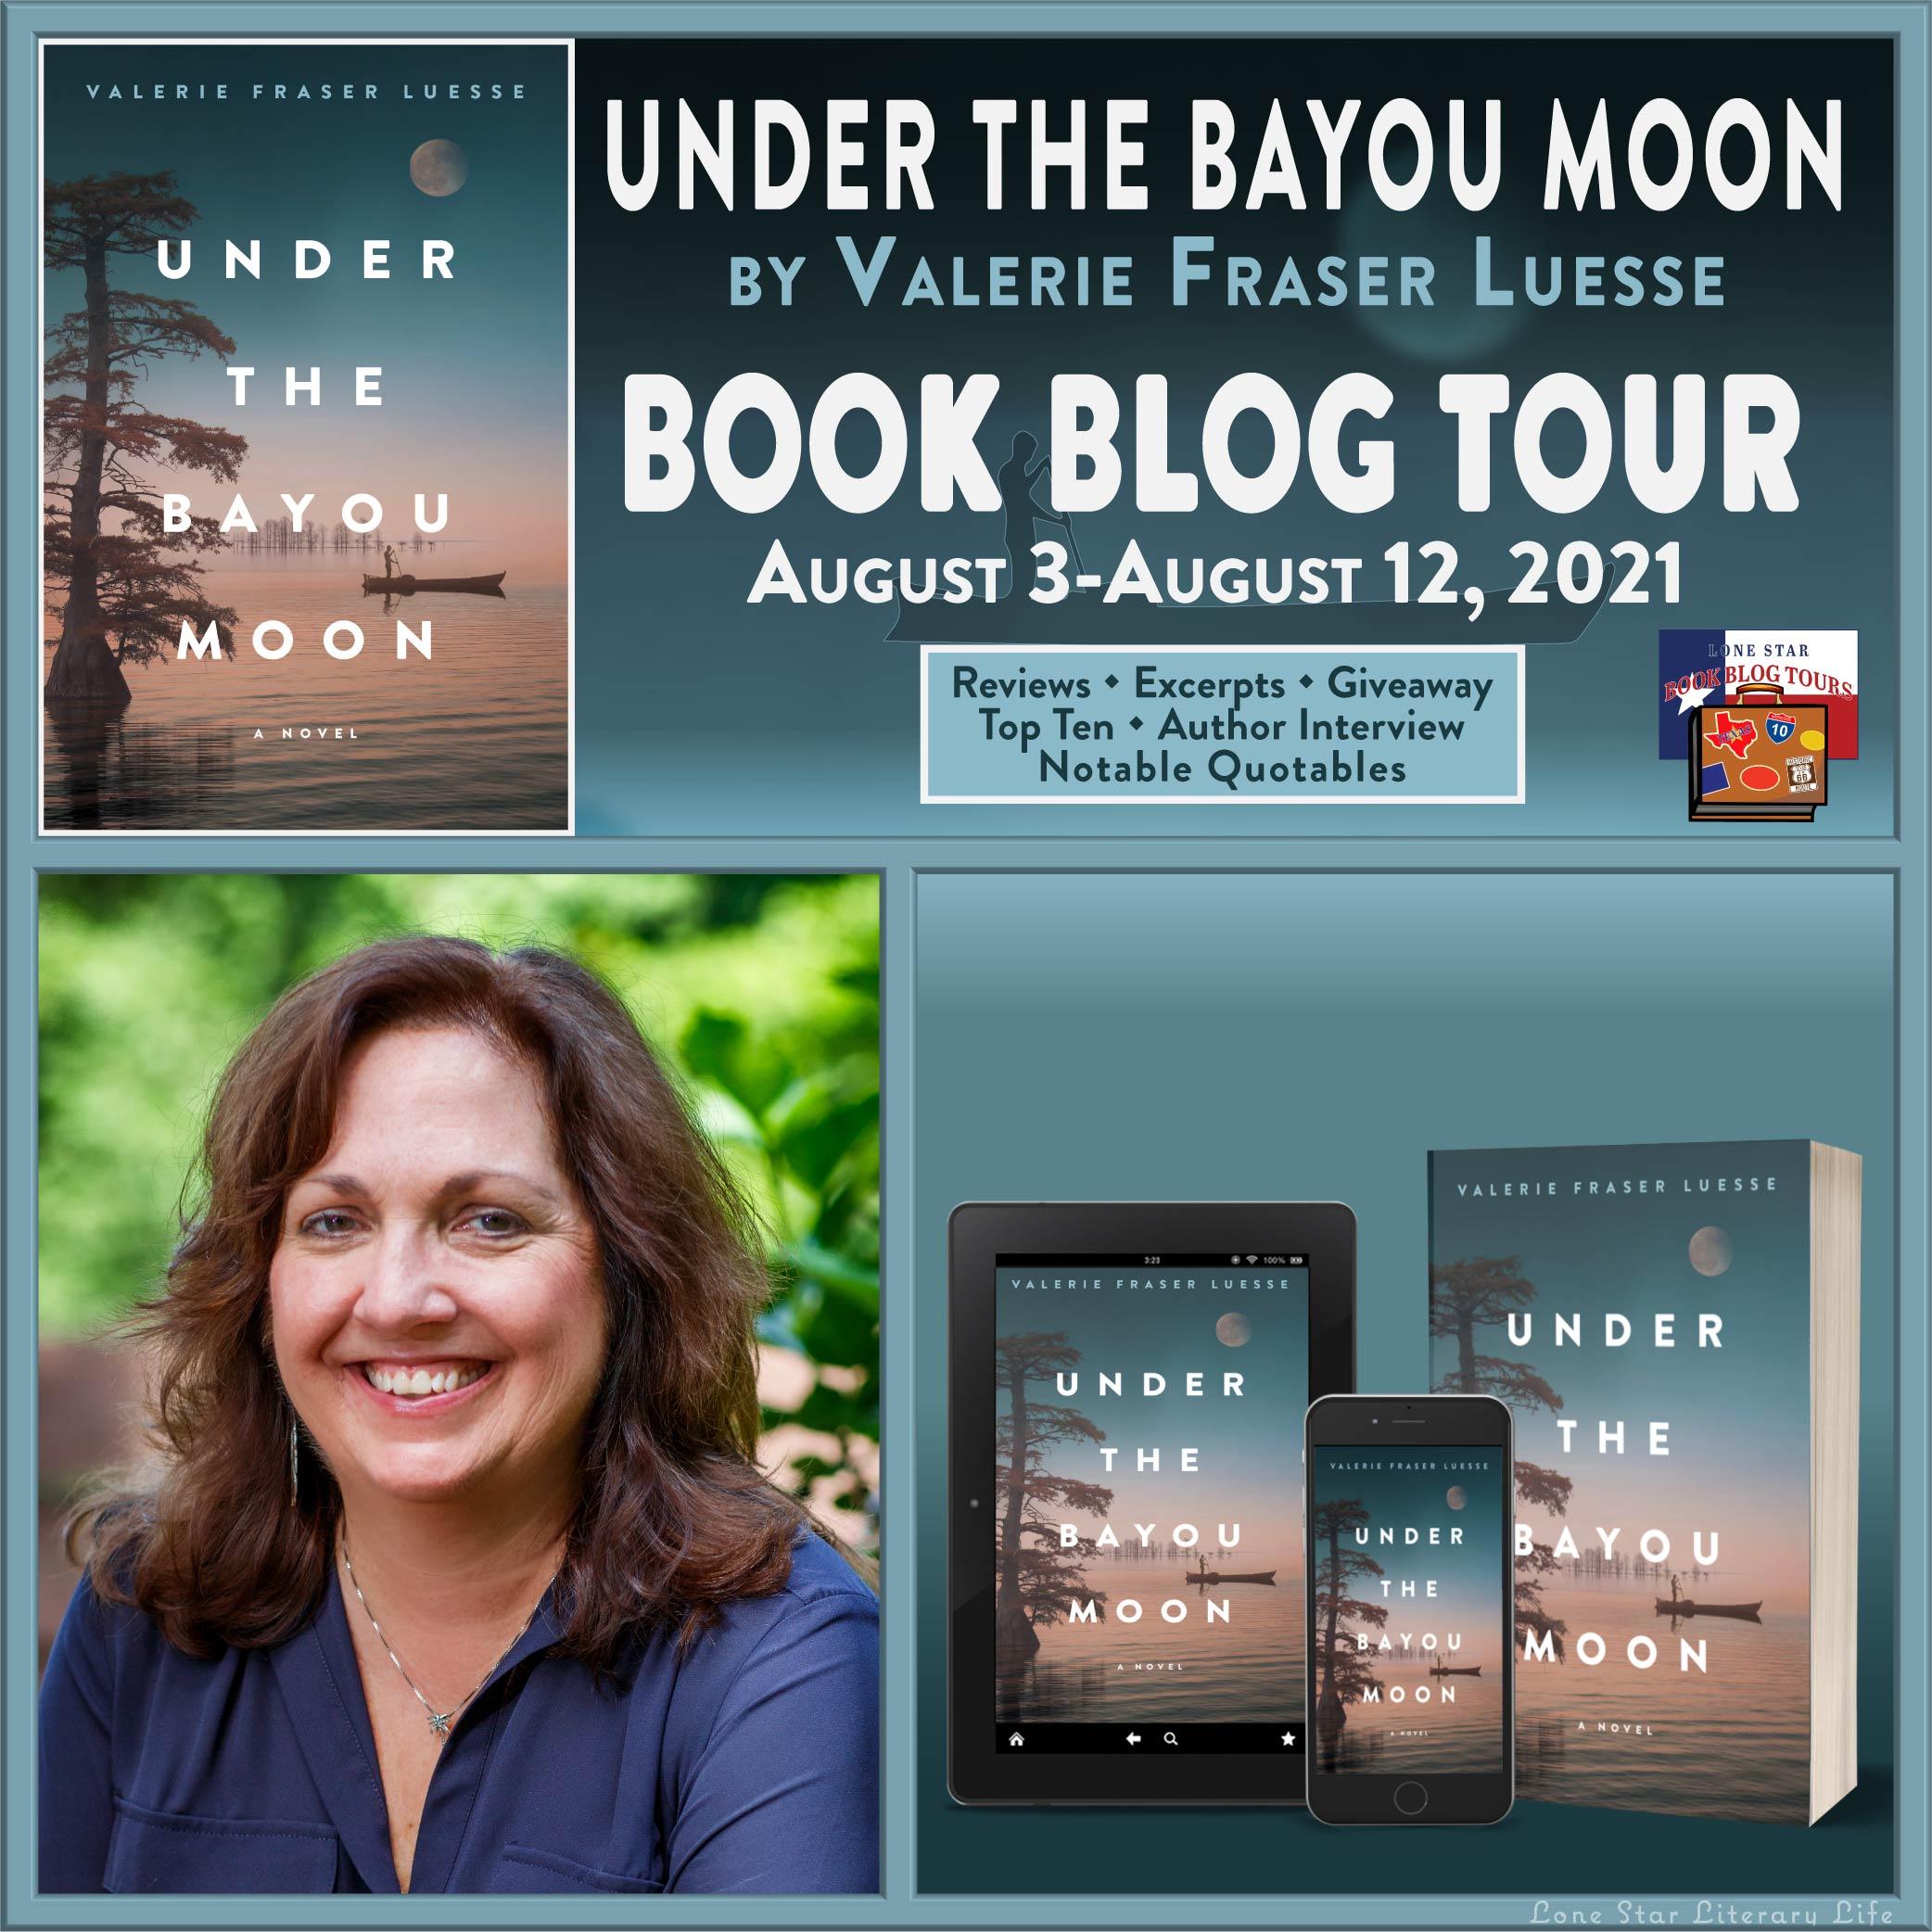 XTRA Under the Bayou Moon 2_IG Post